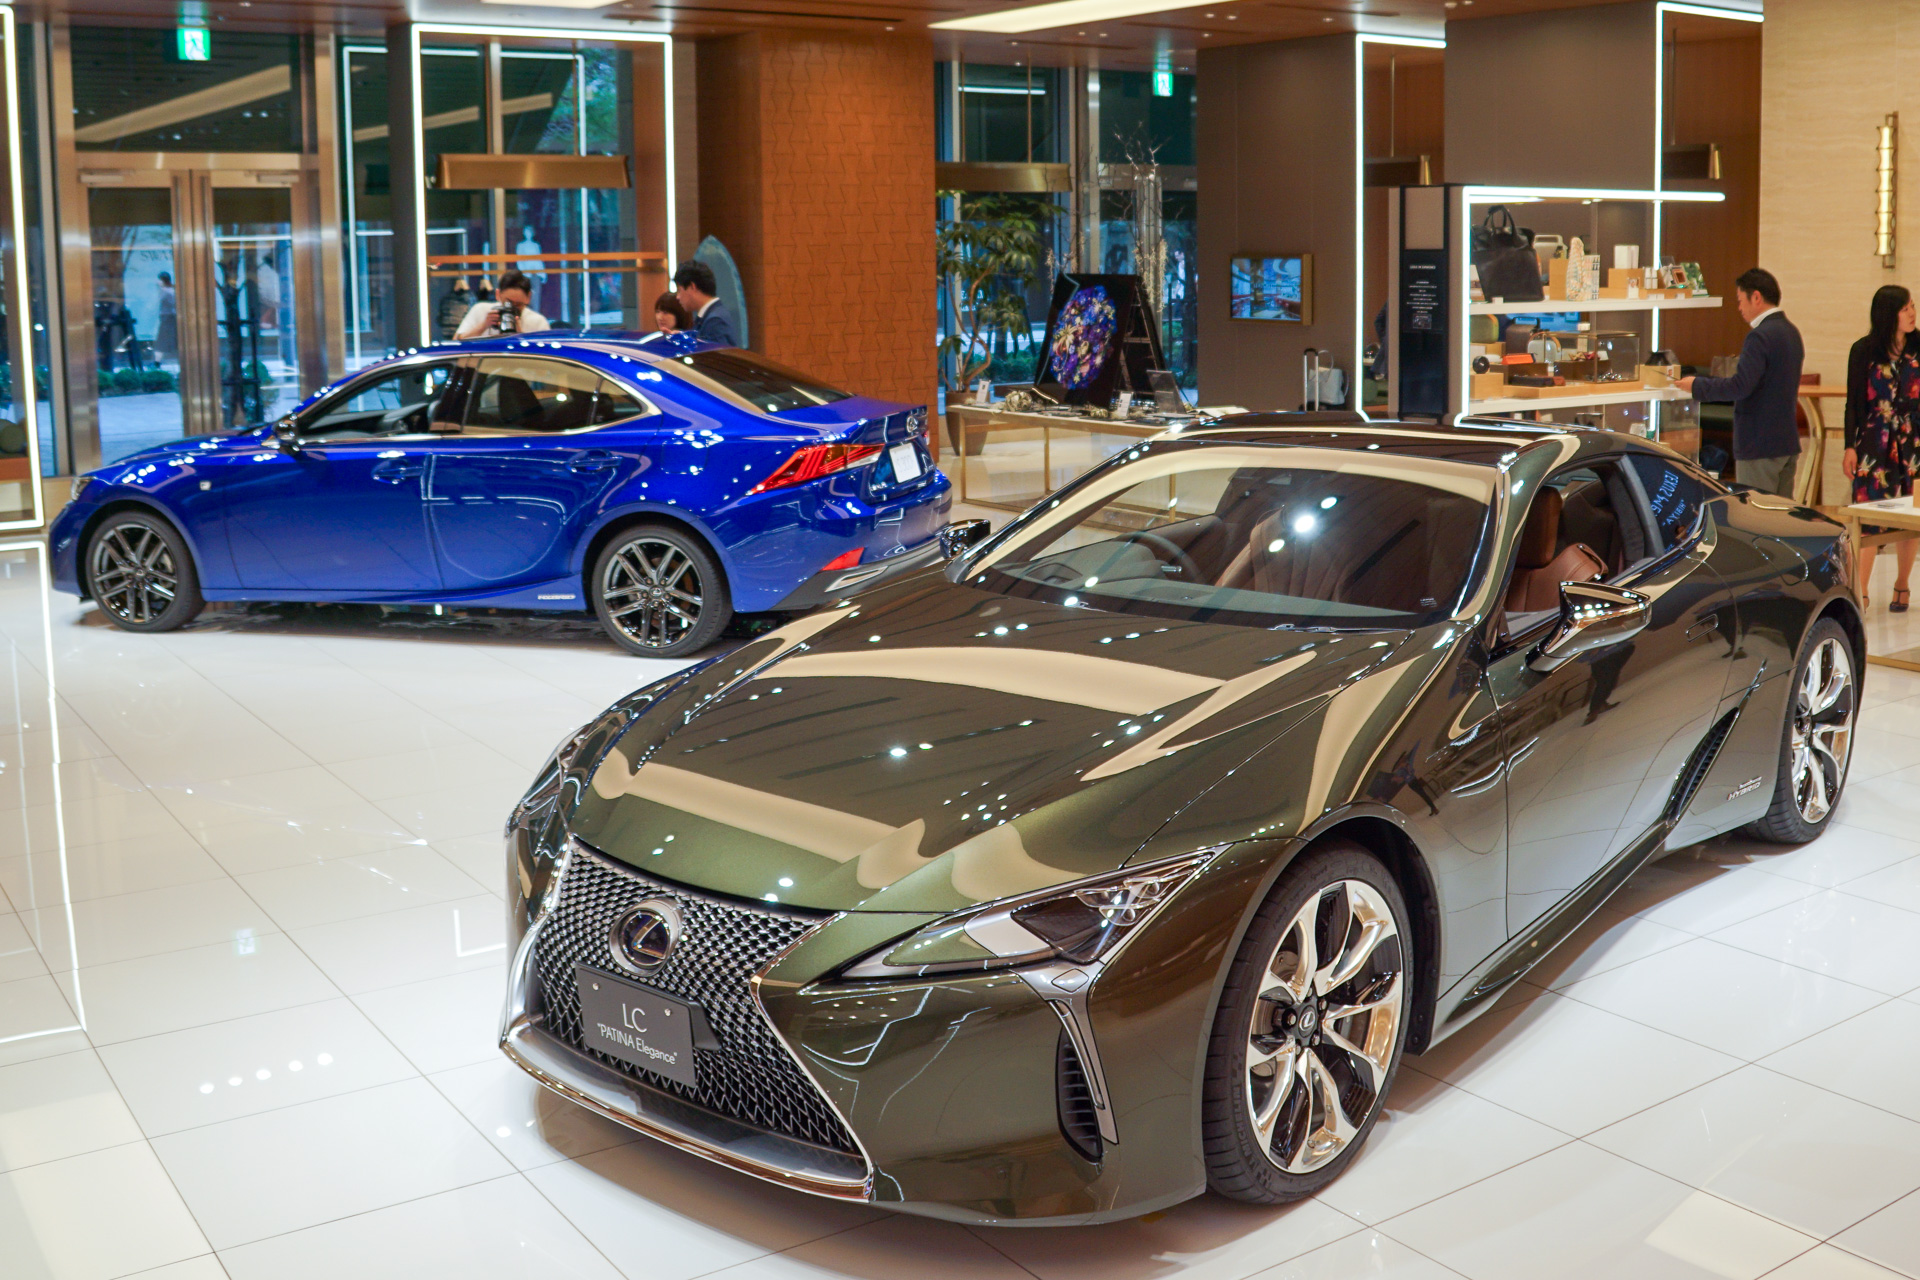 レクサス、特別仕様車IS\u201cI Blue\u201d/LC\u201cPATINA Elegance\u201dを「LEXUS